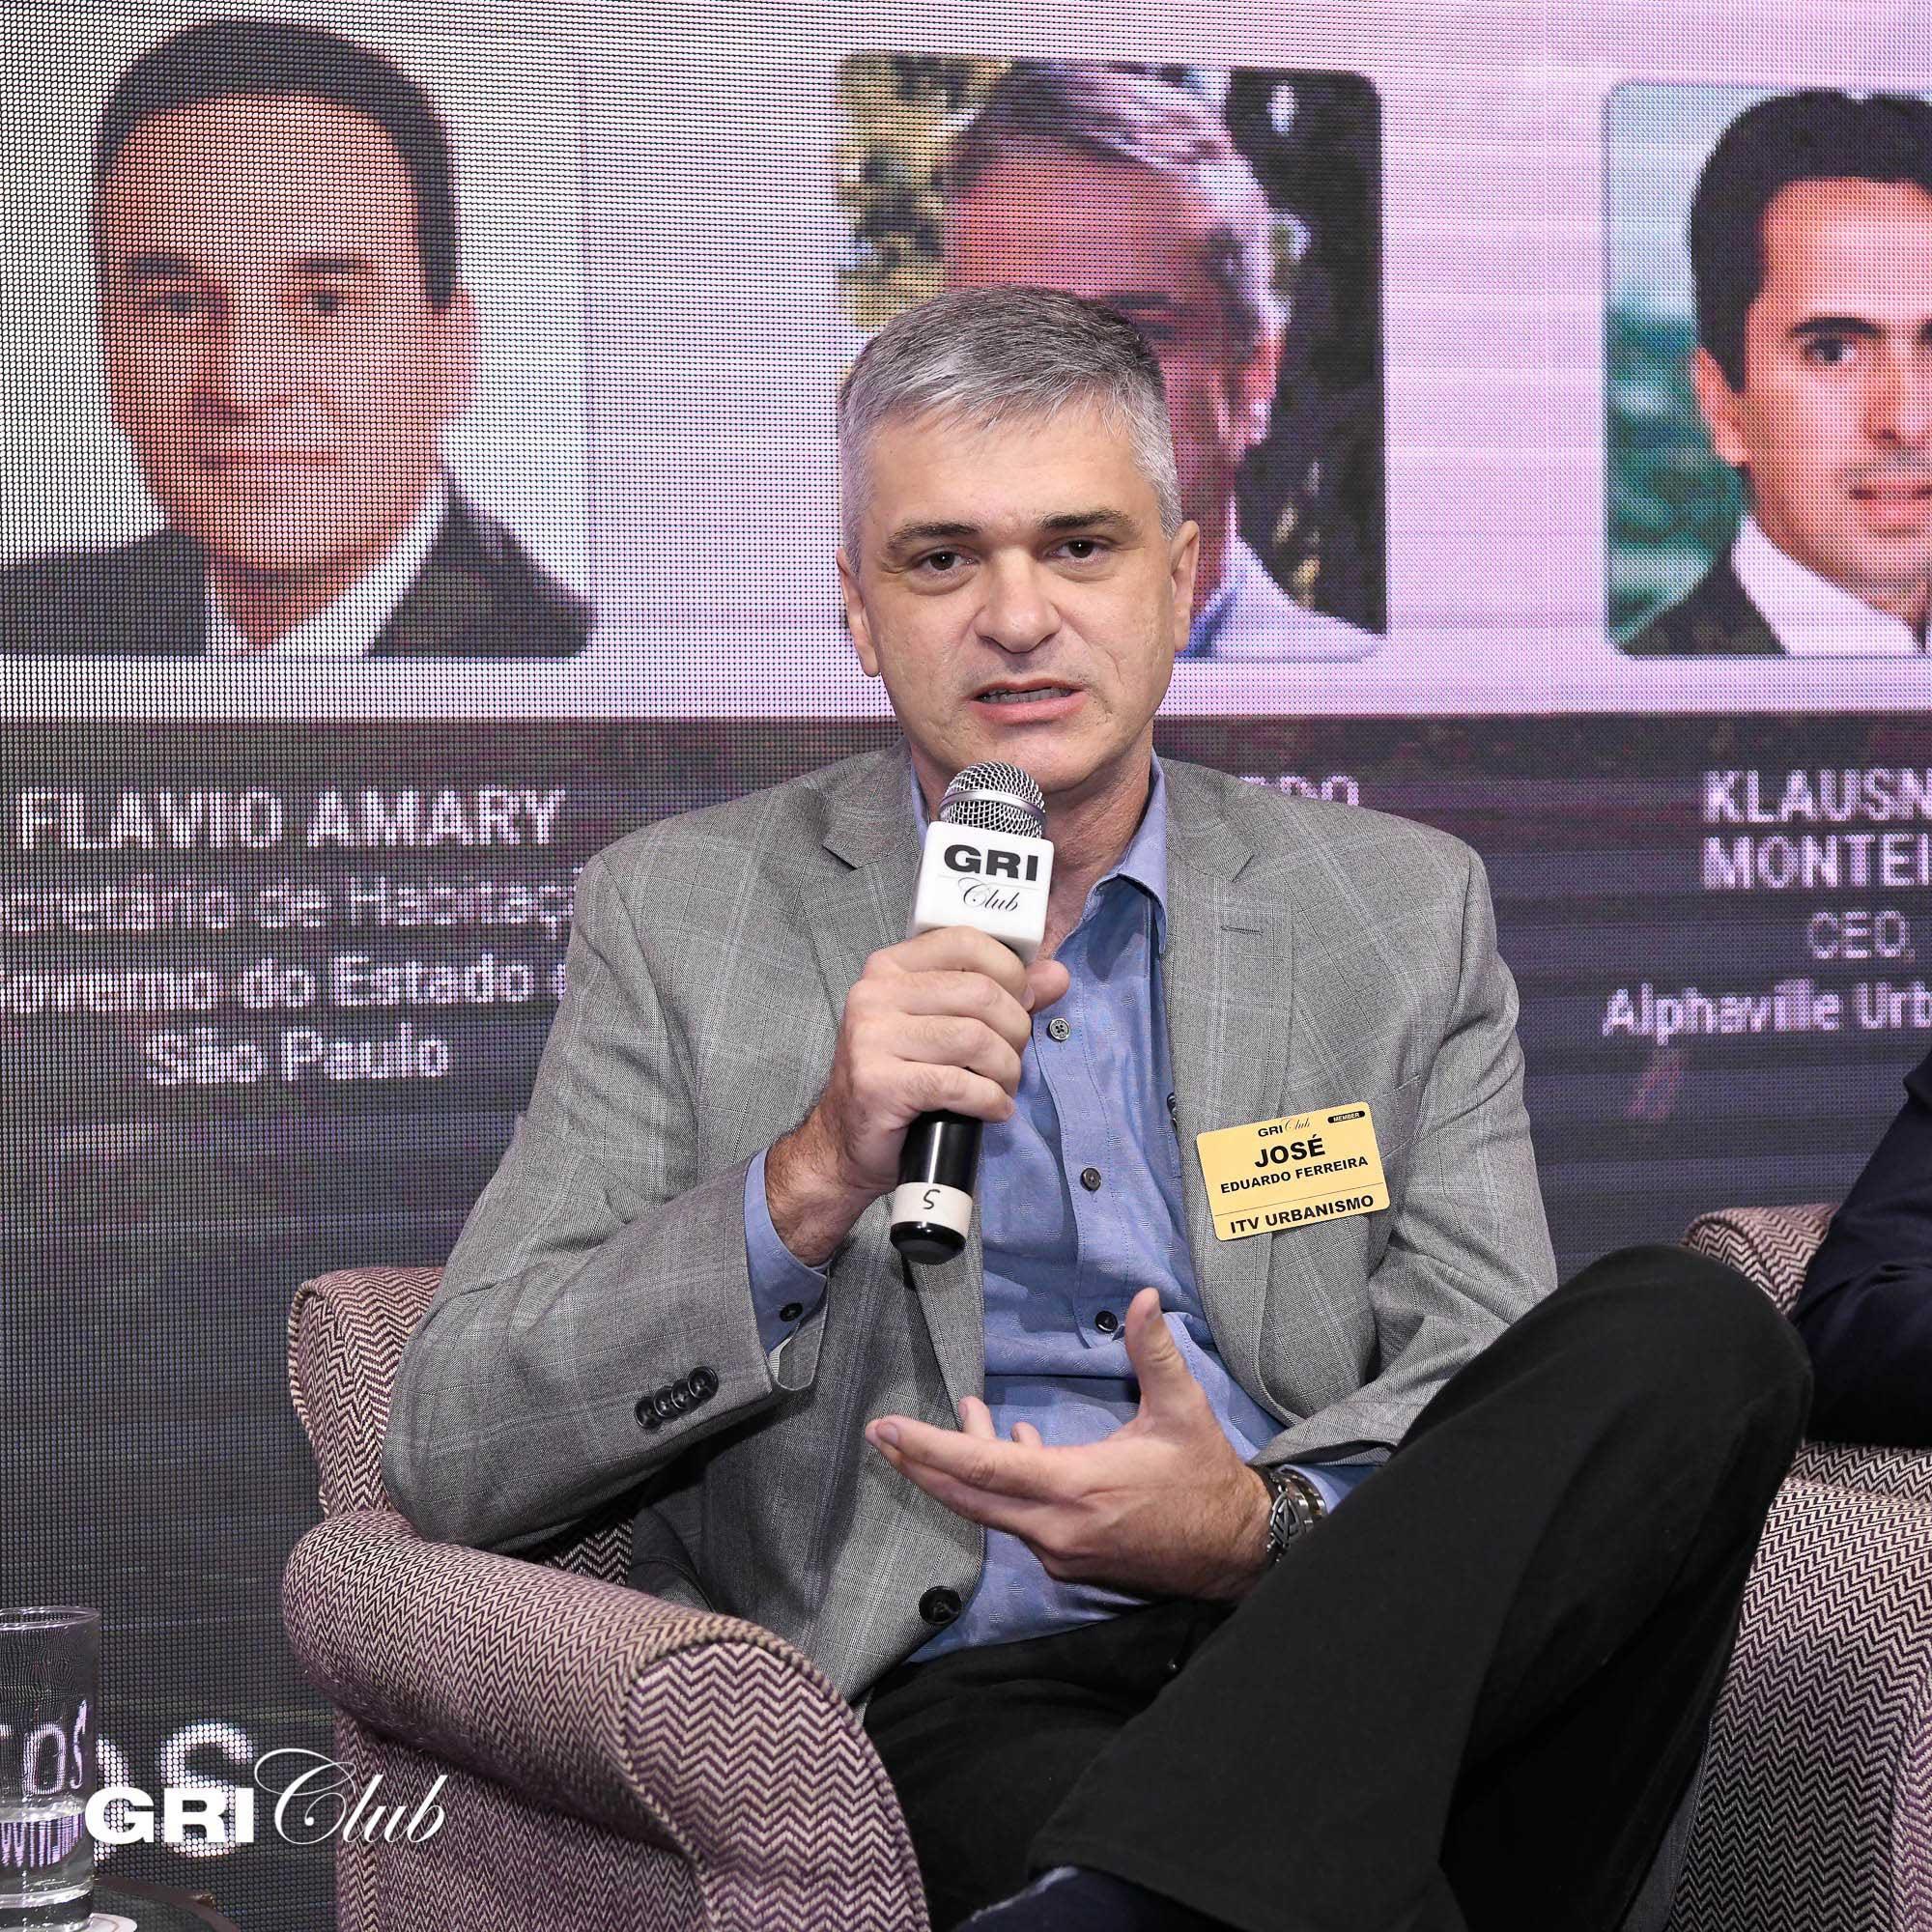 José Eduardo Ferreira, da ITV Urbanismo, durante o GRI Loteamentos 2019 | Crédito: GRI Club/Flavio Guarnieri